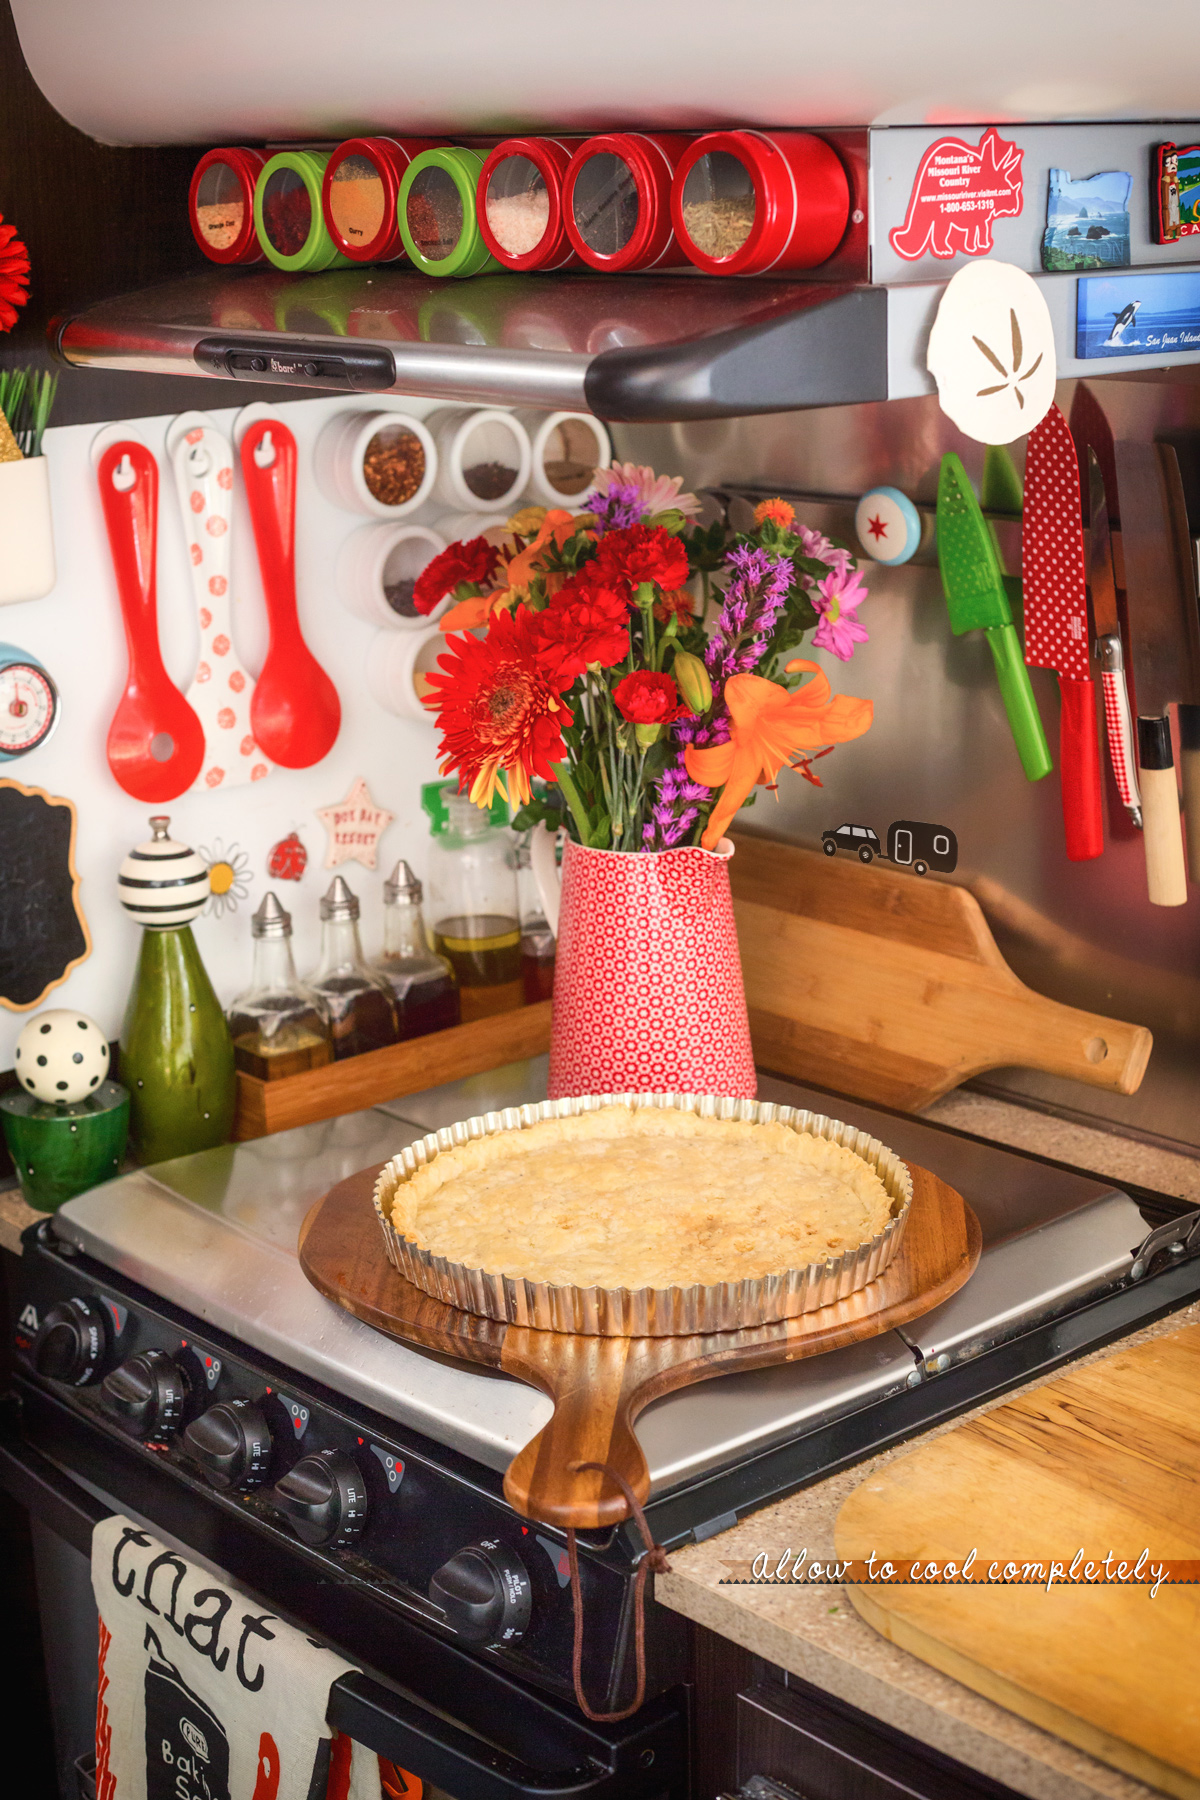 Cooling Vodka Pie Crust via J5MM.com